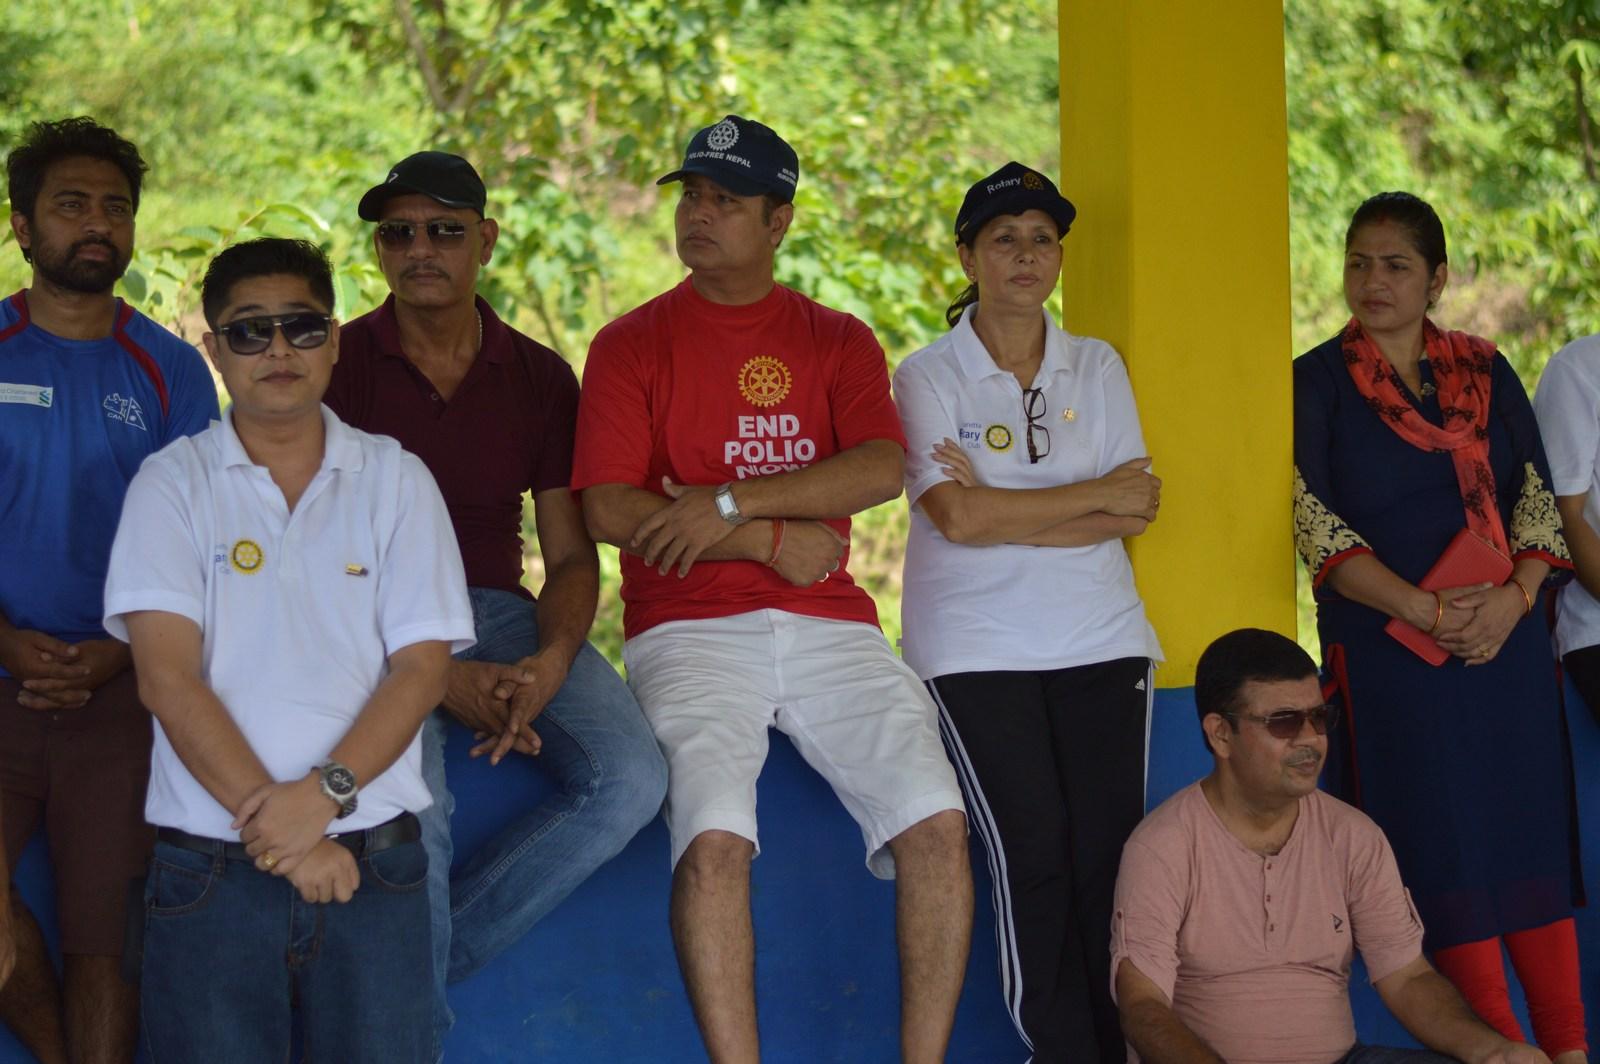 Tree-Pantation-@-Mechi-Ganga-Bishramalaya-Rotary-Club-of-Kakarvitta-7